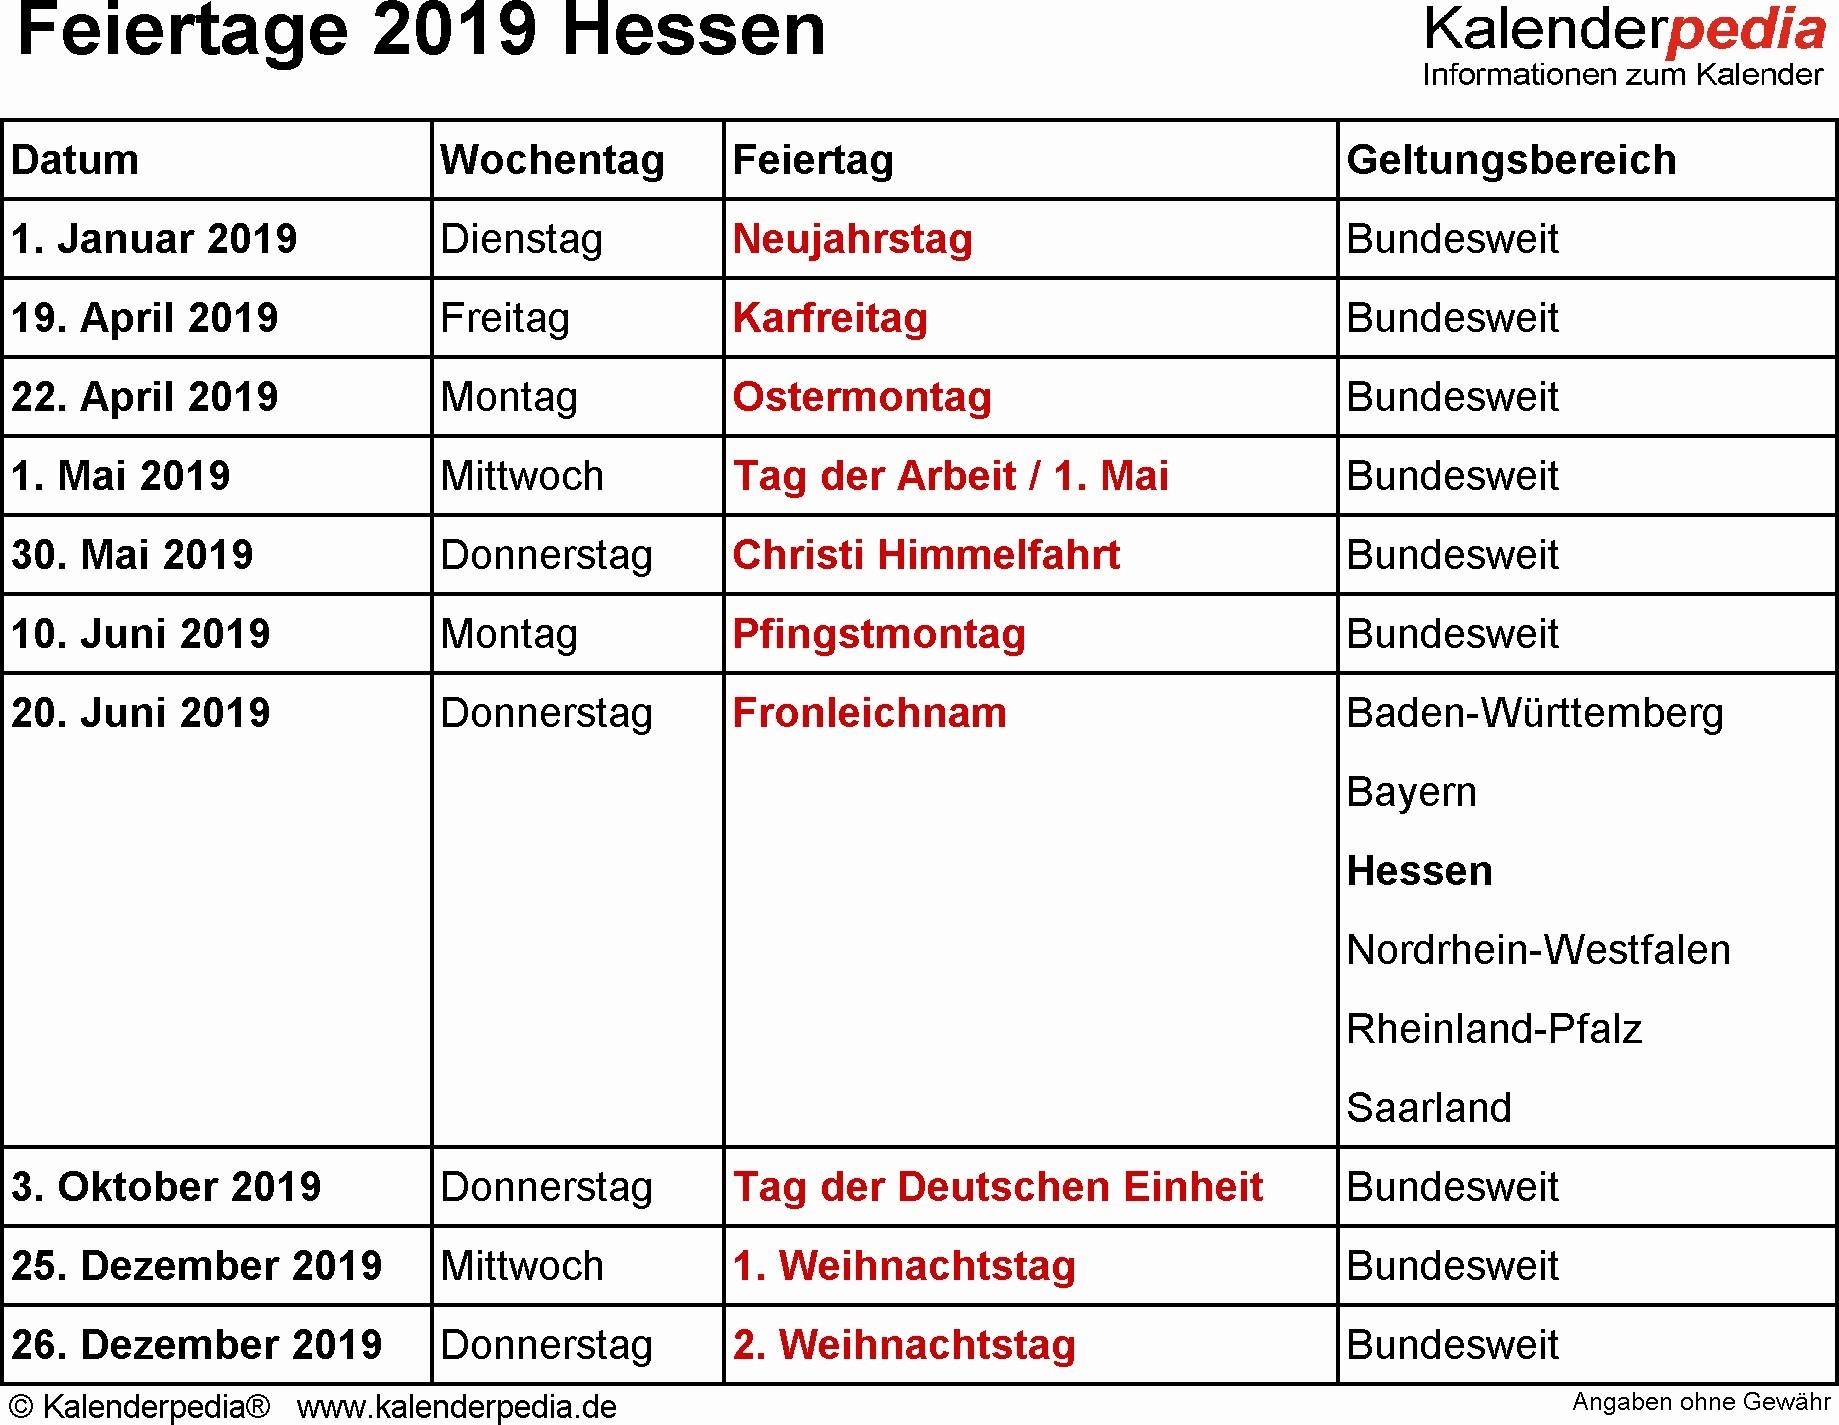 kalender 2019 bayern ferien pdf mas arriba a fecha weihnachtsfeiertage 2019 2020 bayern shterev of kalender 2019 bayern ferien pdf